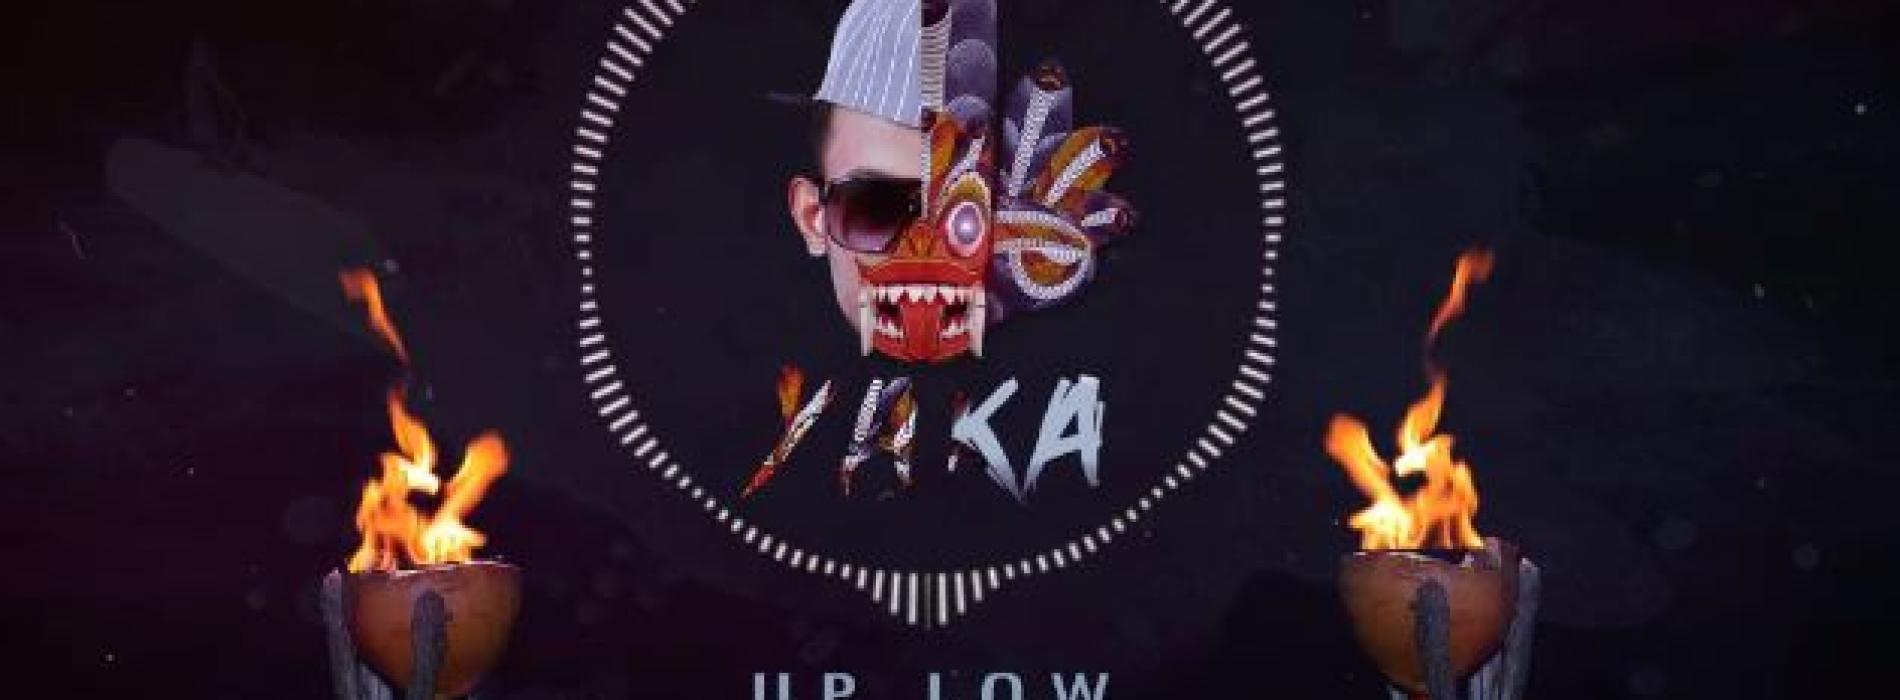 YAKA – Rabana III (Bailatronic Mix) Up ගෙදරයි Low ගෙදරයි